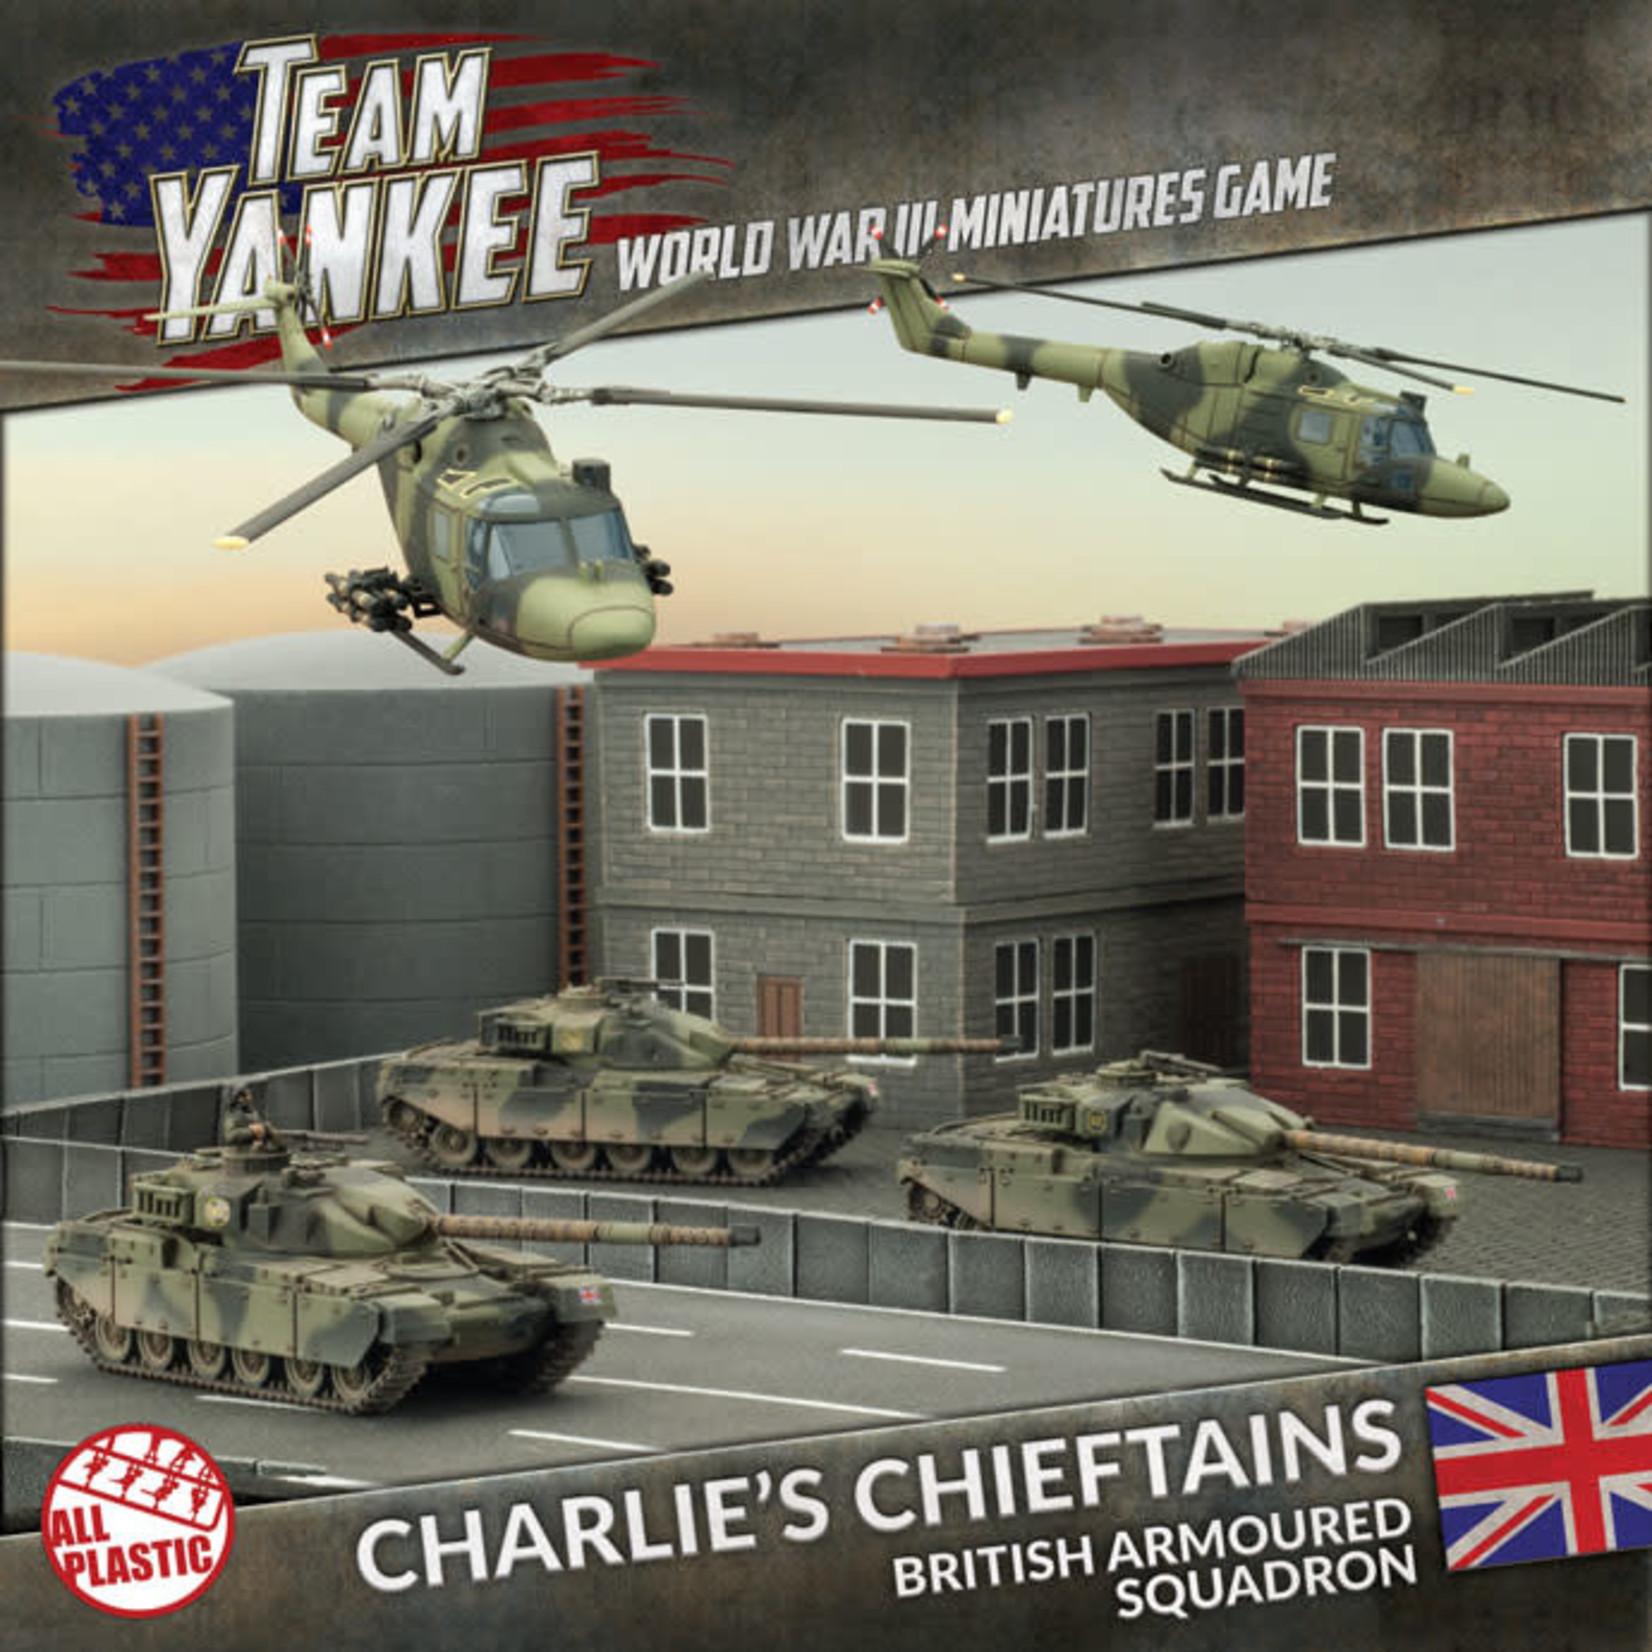 Battlefront Miniatures Ltd Team Yankee - World War III | Charlie's Chieftains (Plastic Army Deal)